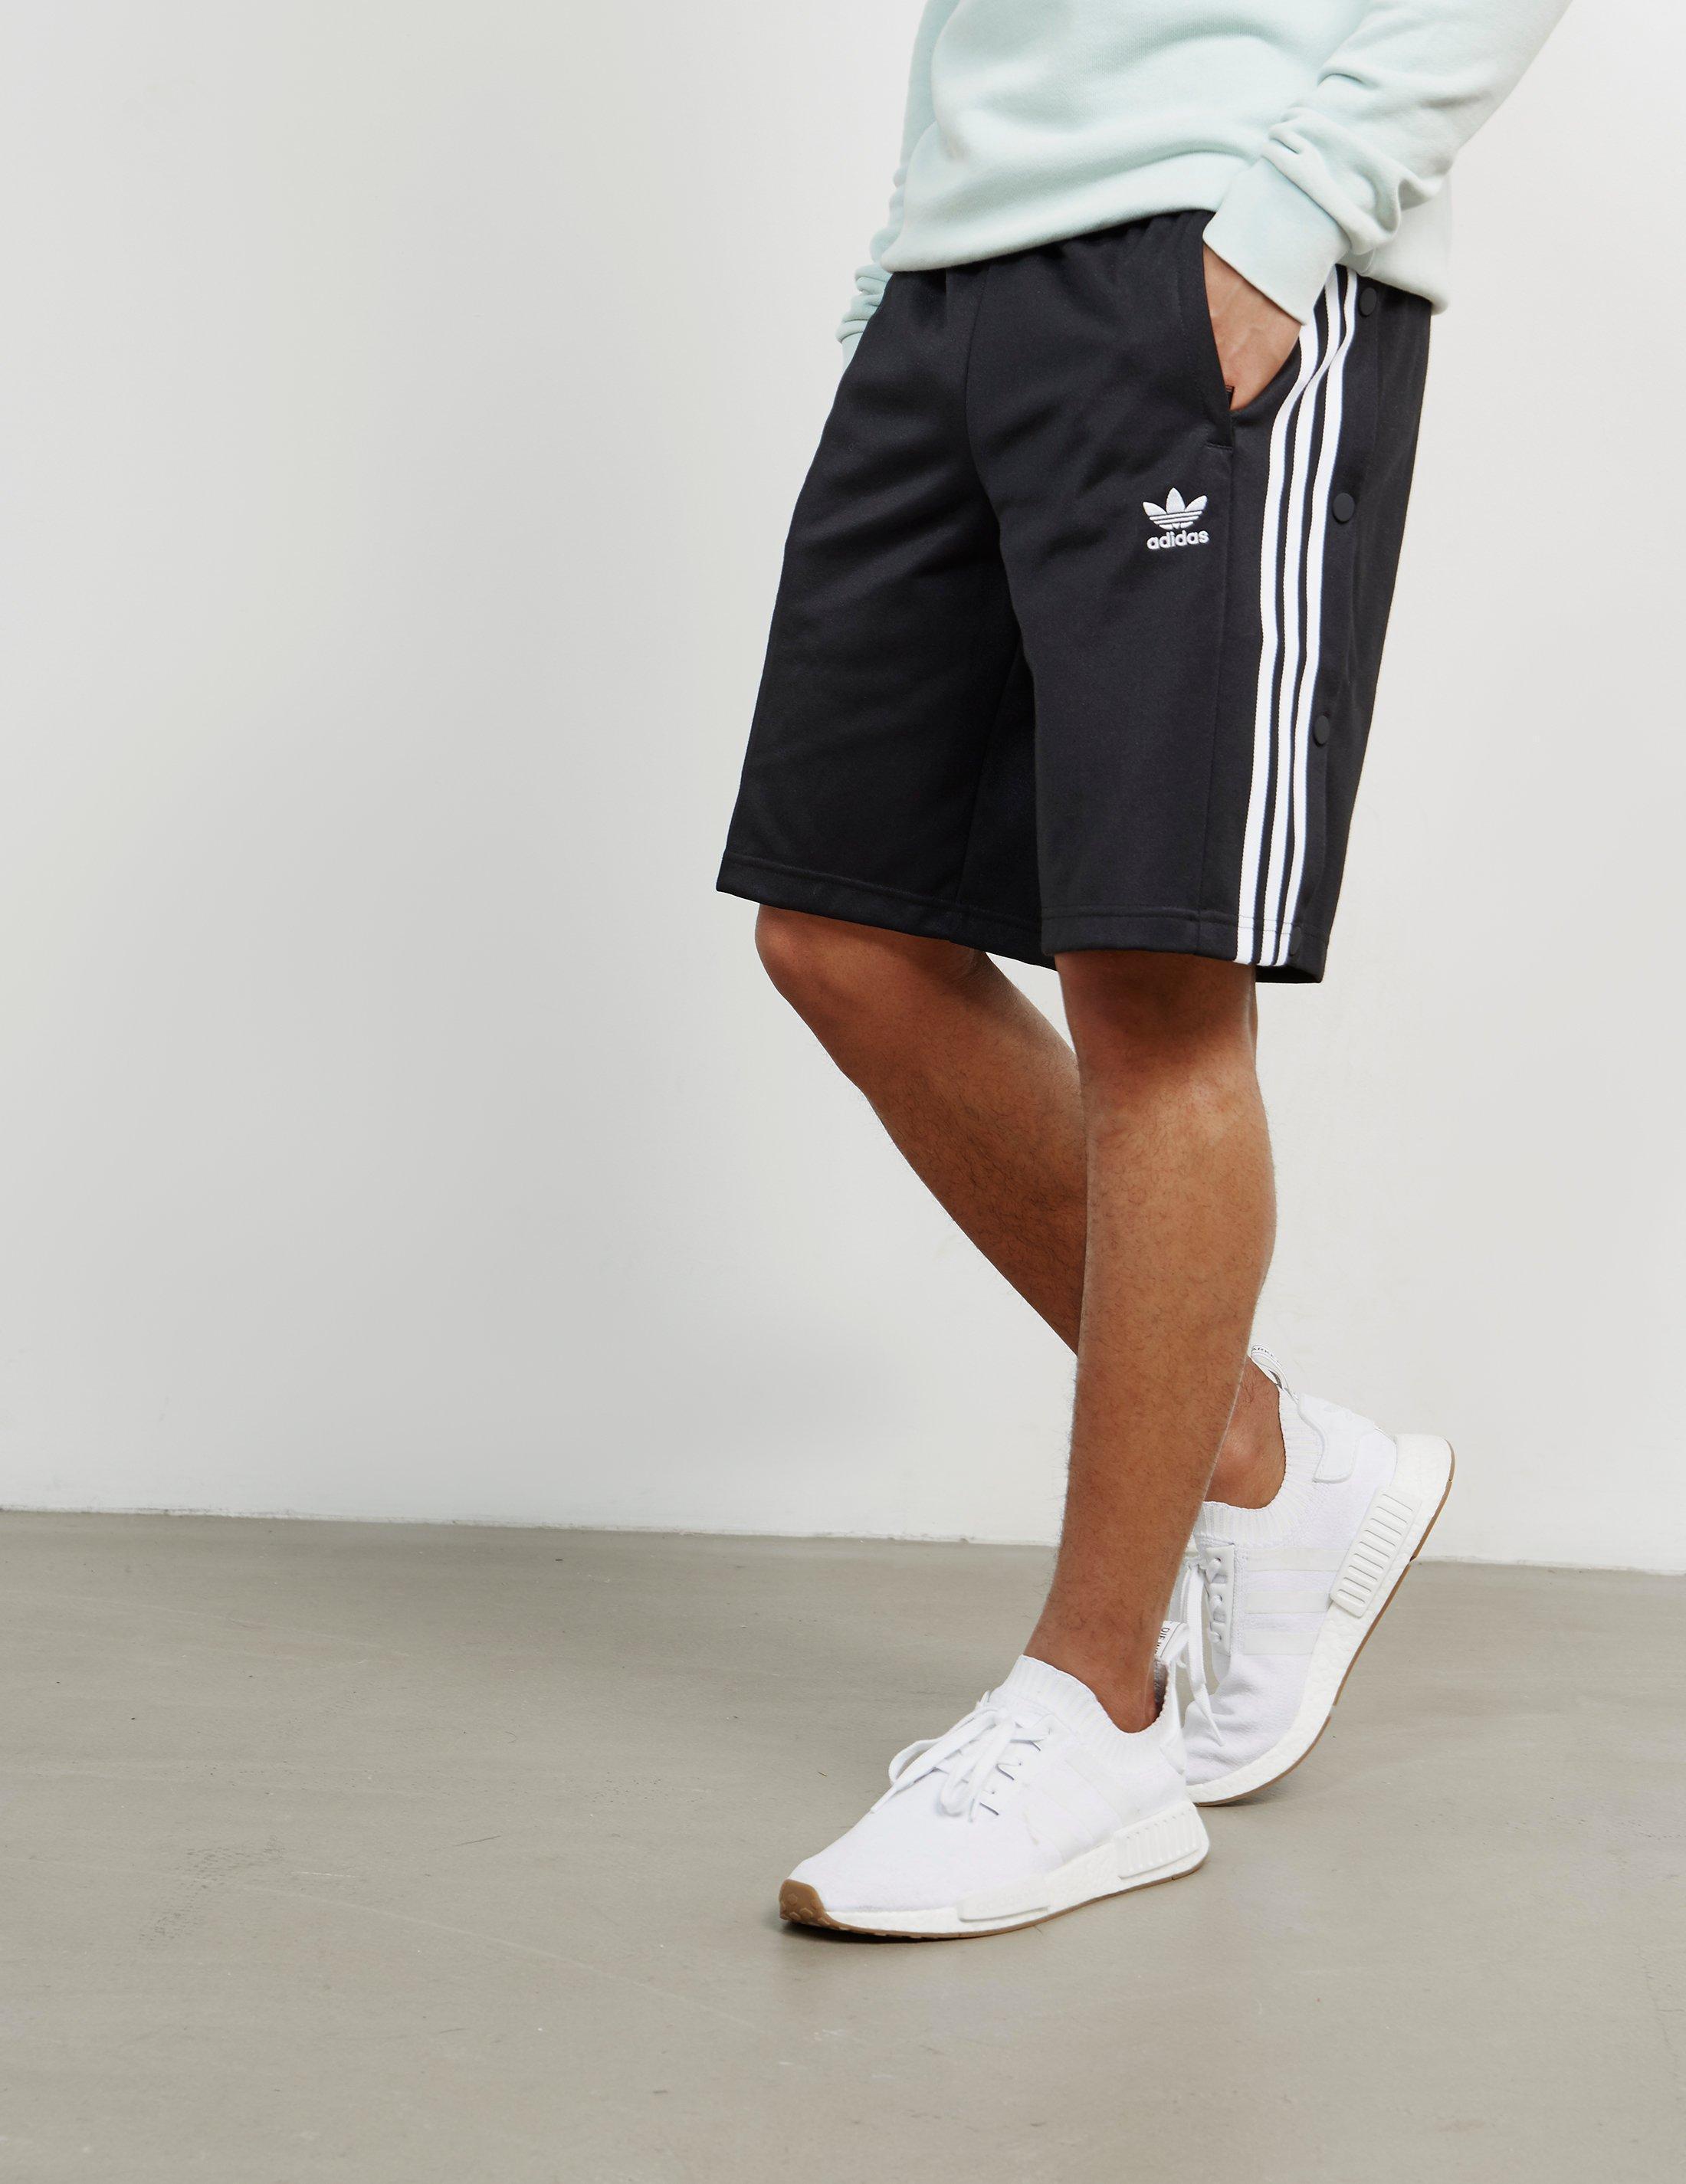 Adidas Originals Mens Snap Button Shorts Blackblack for men